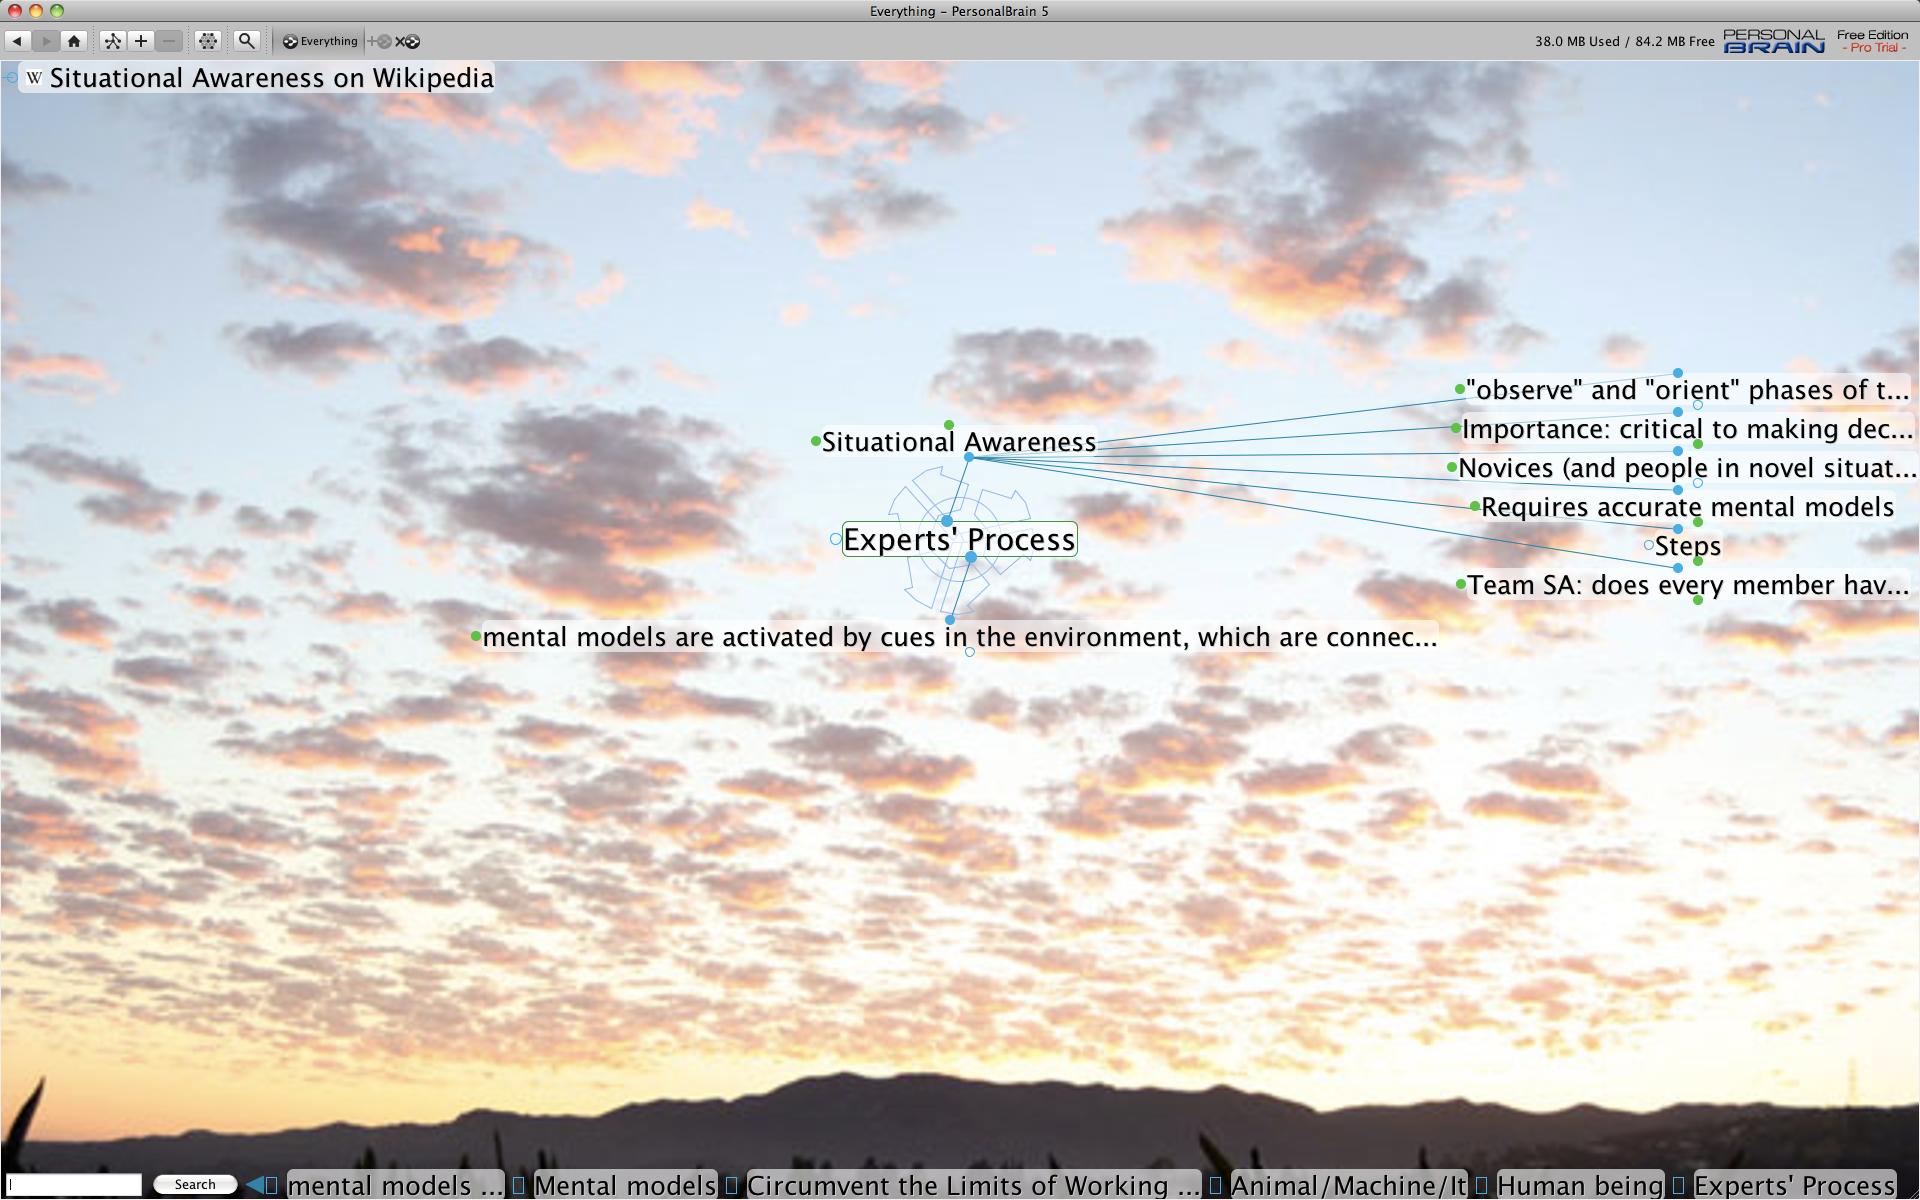 Click image for larger version - Name: Screen_shot_2009-10-18_at_October_18,_2009_10.47.07_PM_(2).png, Views: 51, Size: 2.03 MB